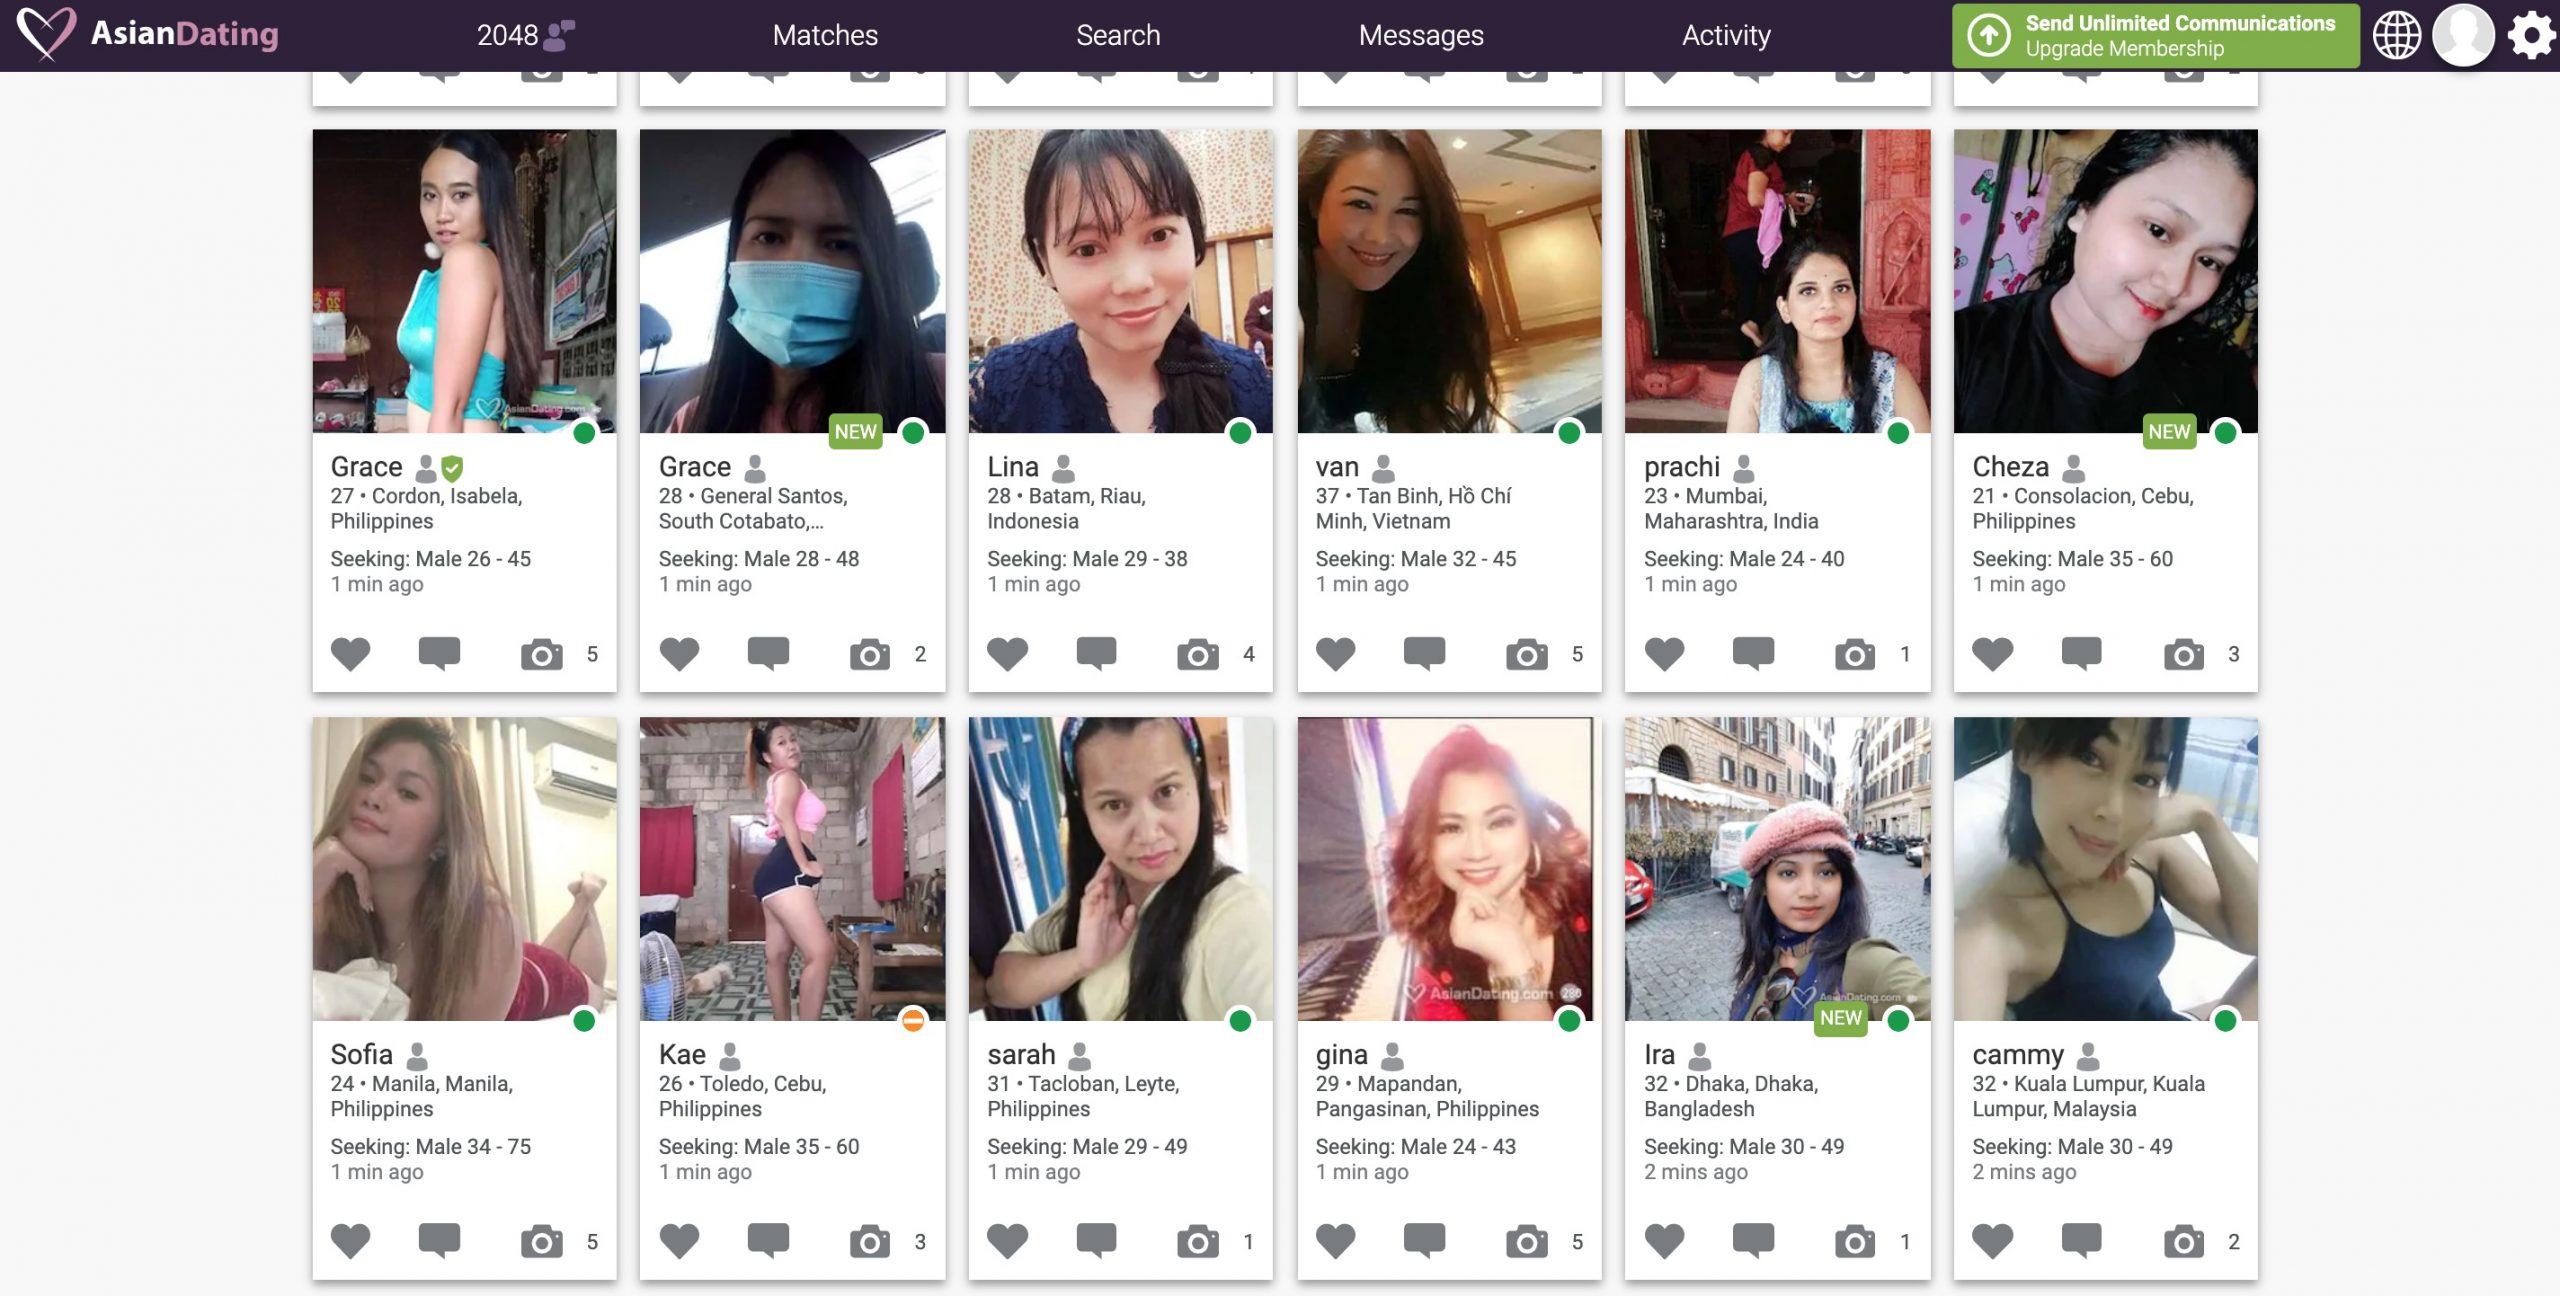 AsianDating women profiles